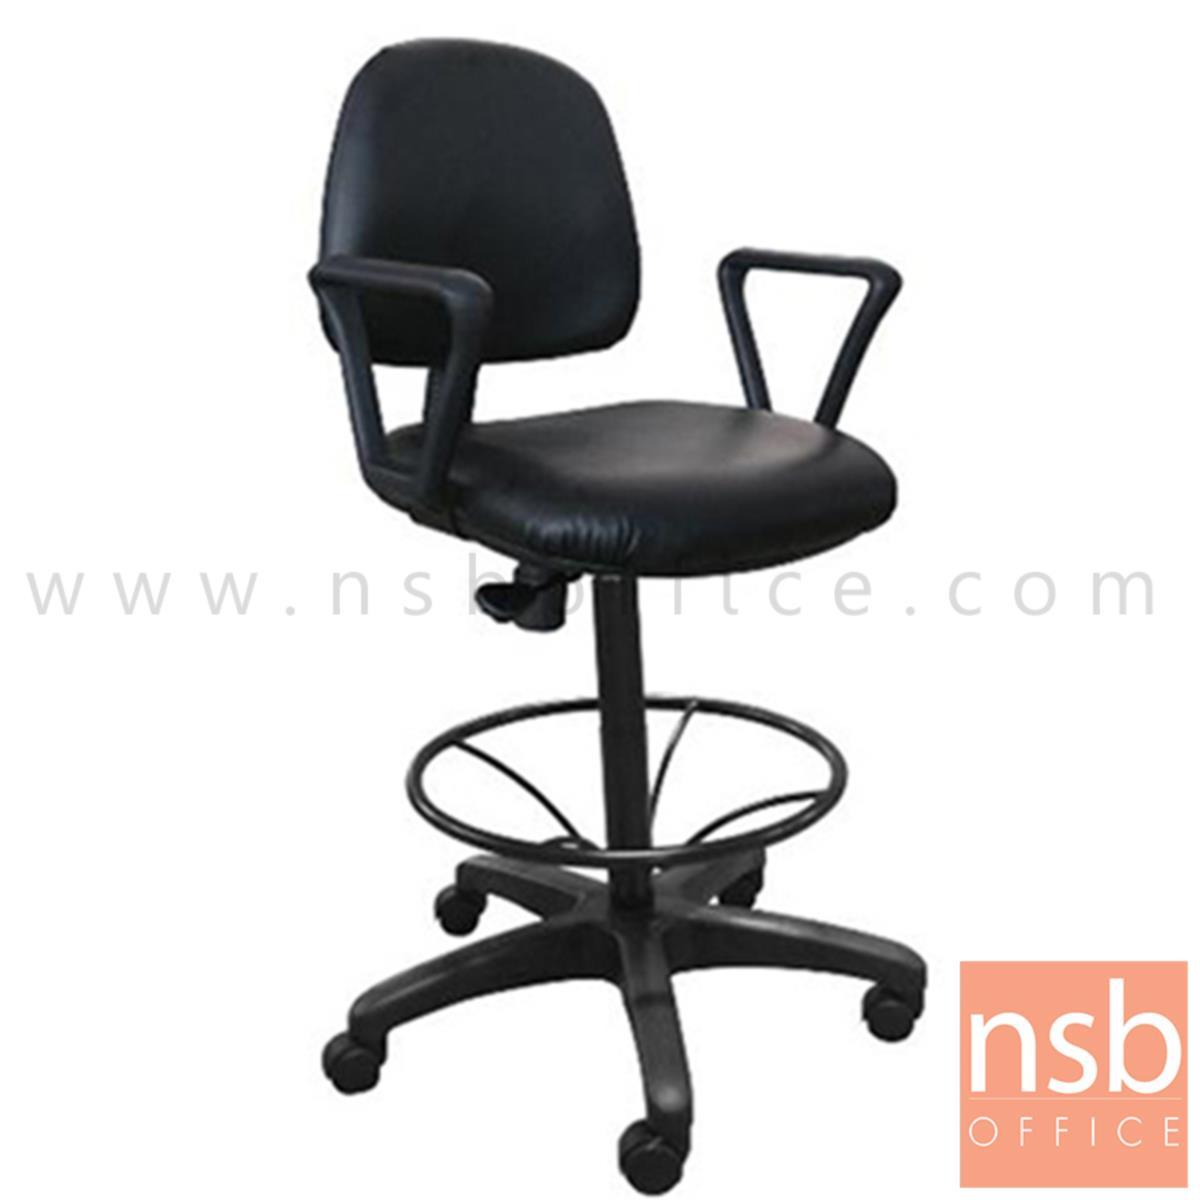 B02A061:เก้าอี้บาร์ที่นั่งเหลี่ยมล้อเลื่อน รุ่น Grave (เกรฟ)  โช๊คแก๊ส มีก้อนโยก ขาพลาสติกแบบตัน